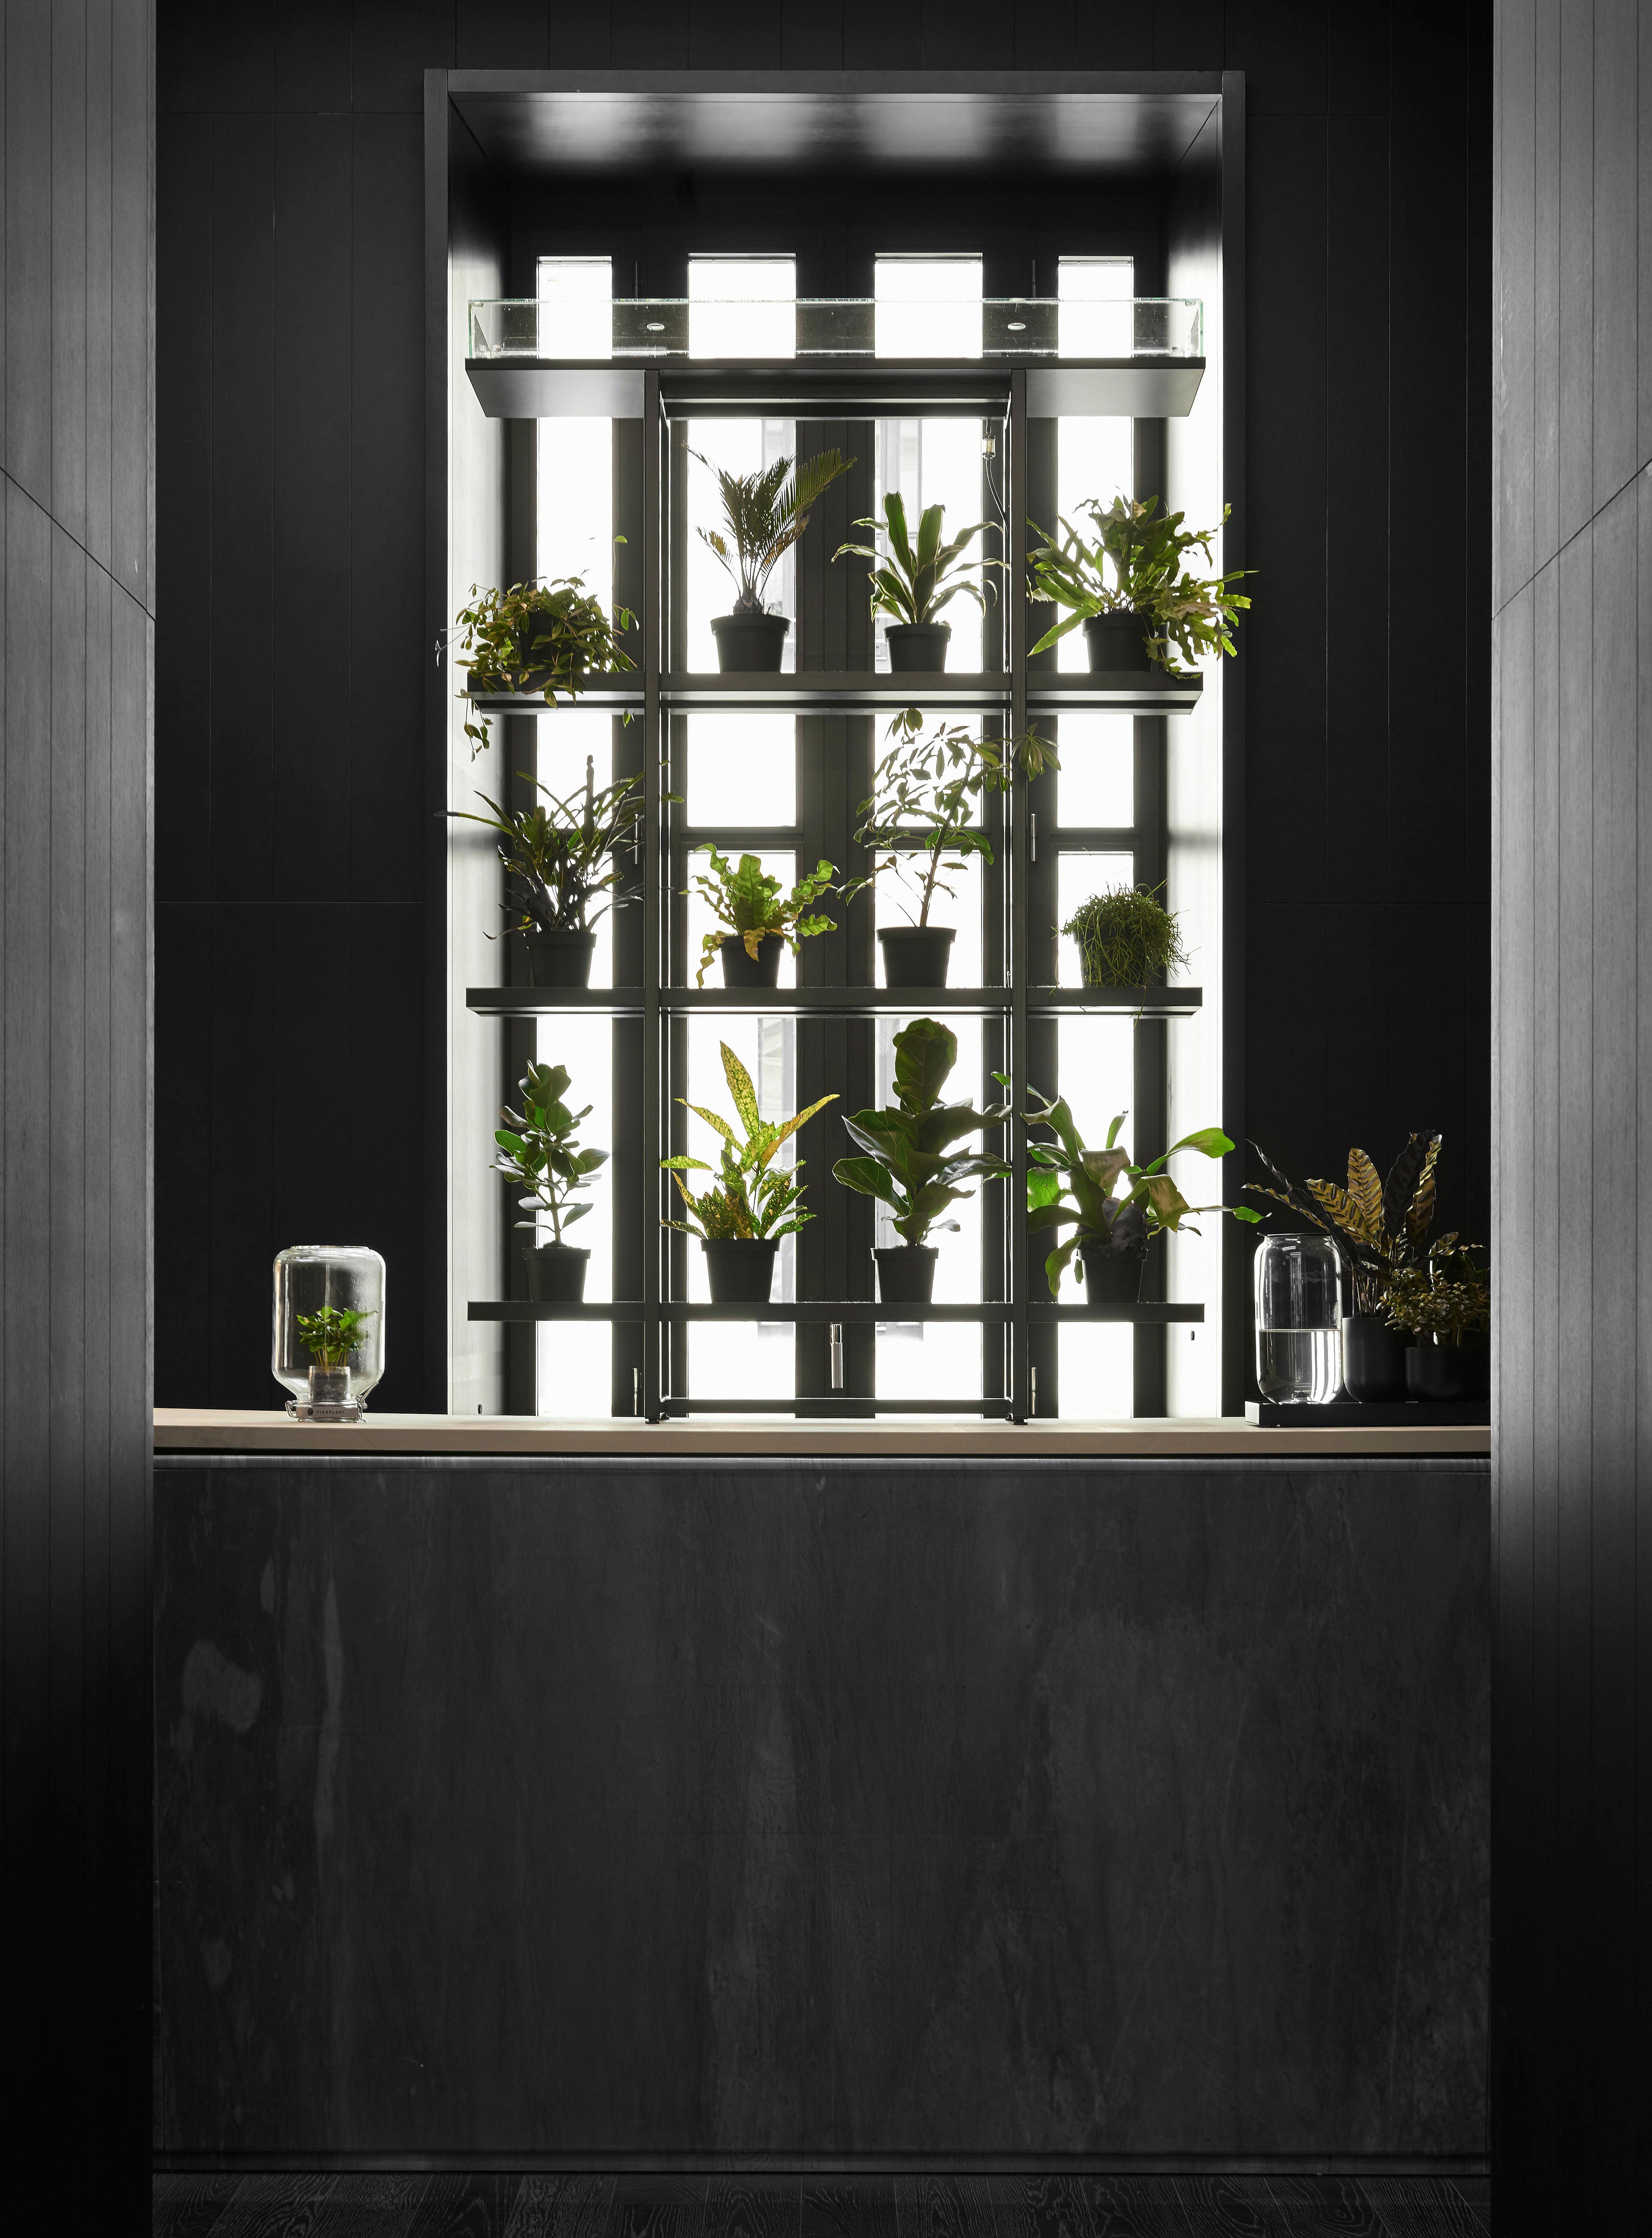 serre autonome jar mini caf ier inclus h 28 cm caf ier. Black Bedroom Furniture Sets. Home Design Ideas